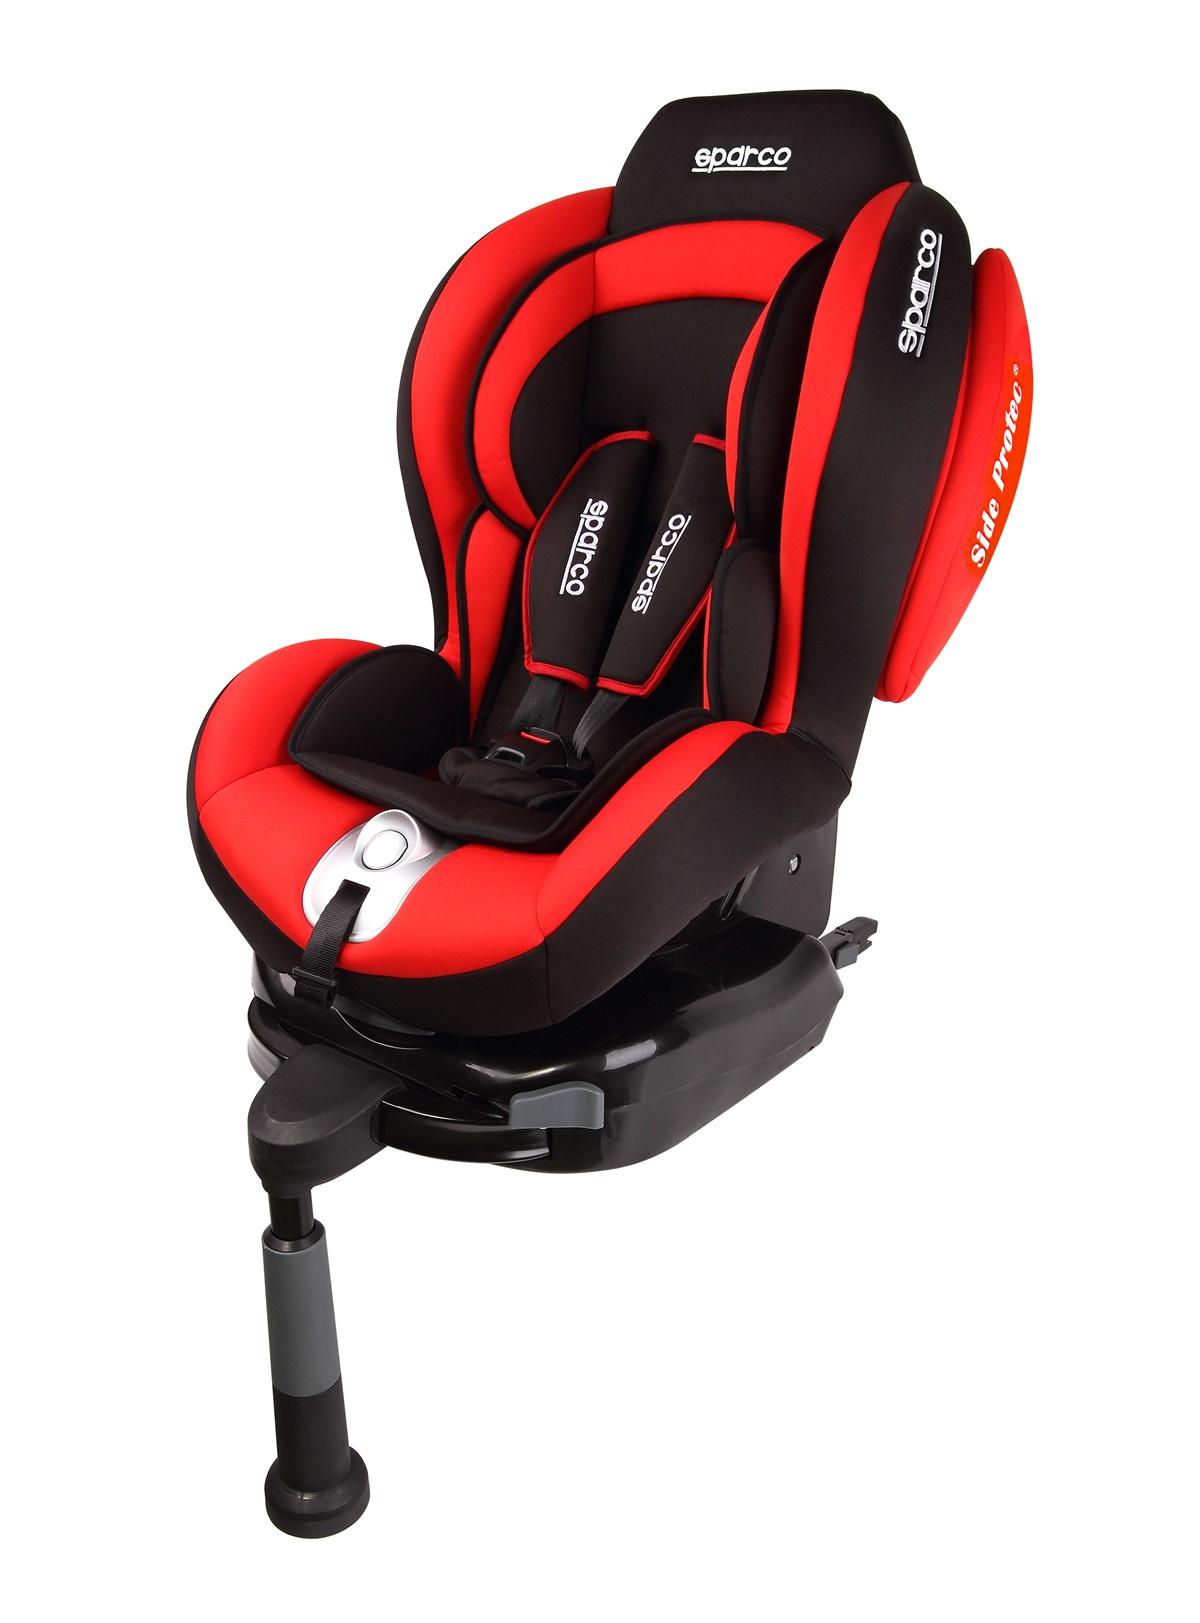 Sparco F500i Red Isofix (AKSF500IRD) 9-18 Kg 6922516301713 auto bērnu sēdeklītis